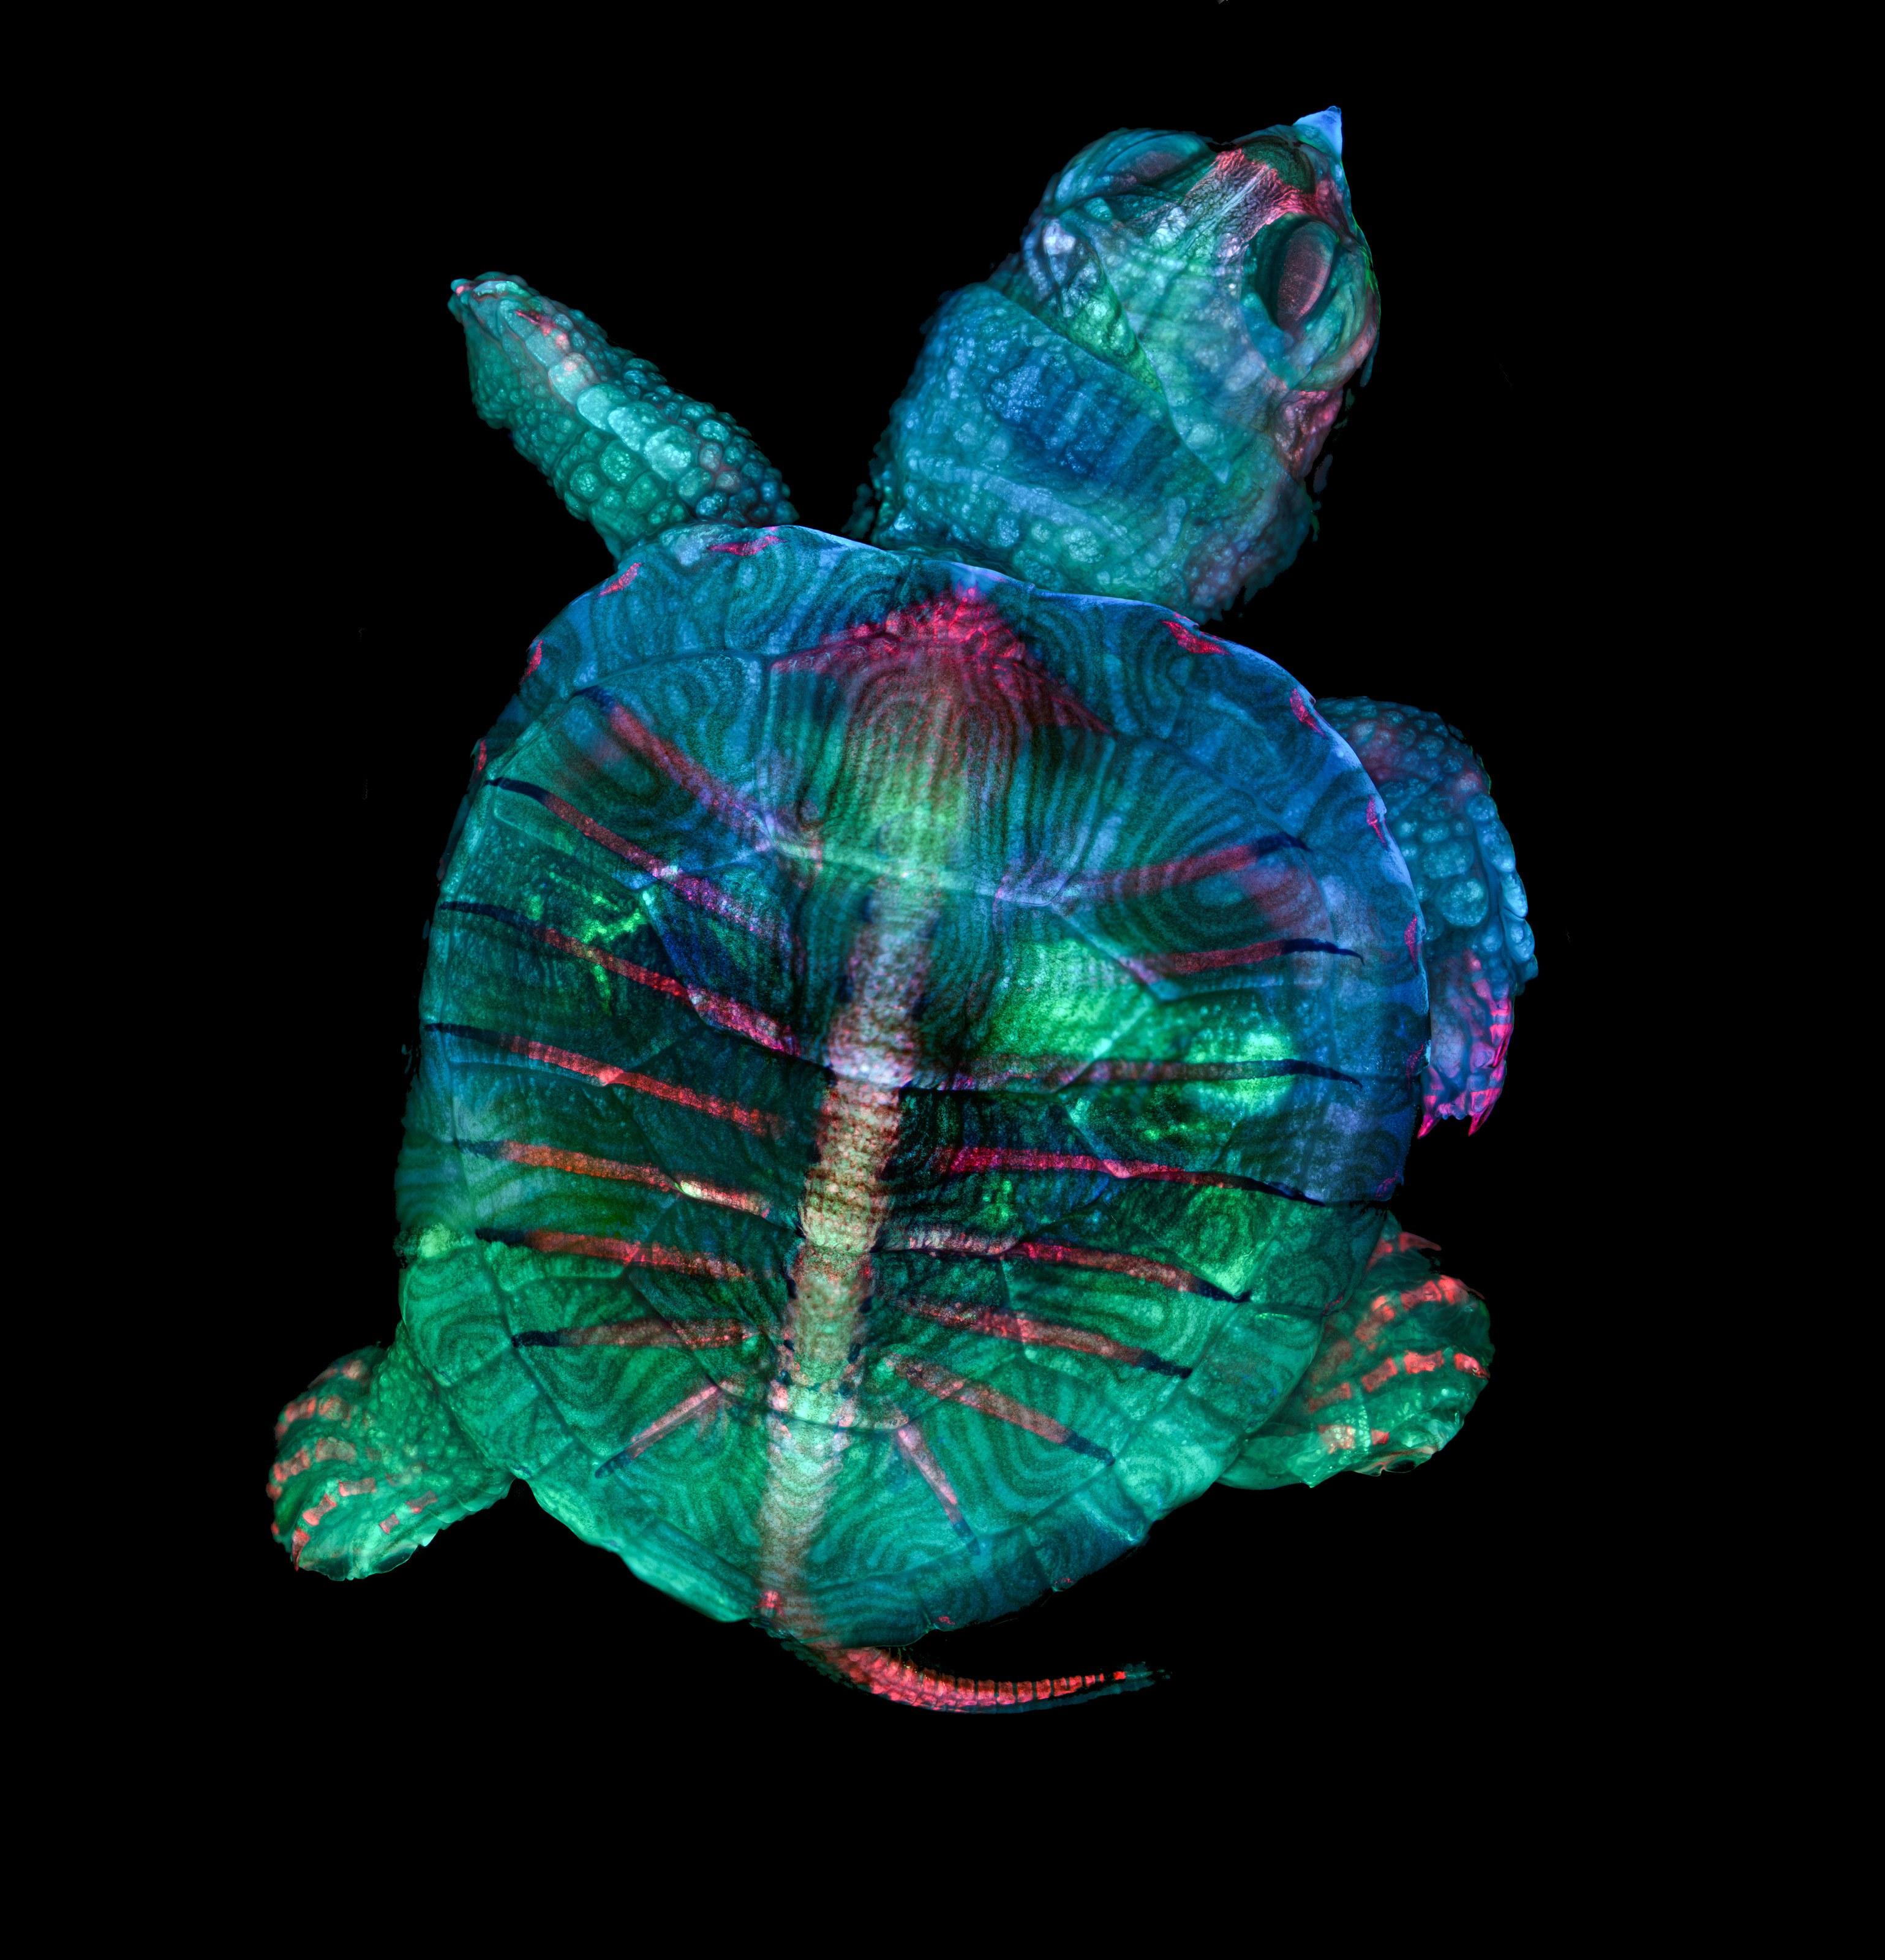 turtle under microscope